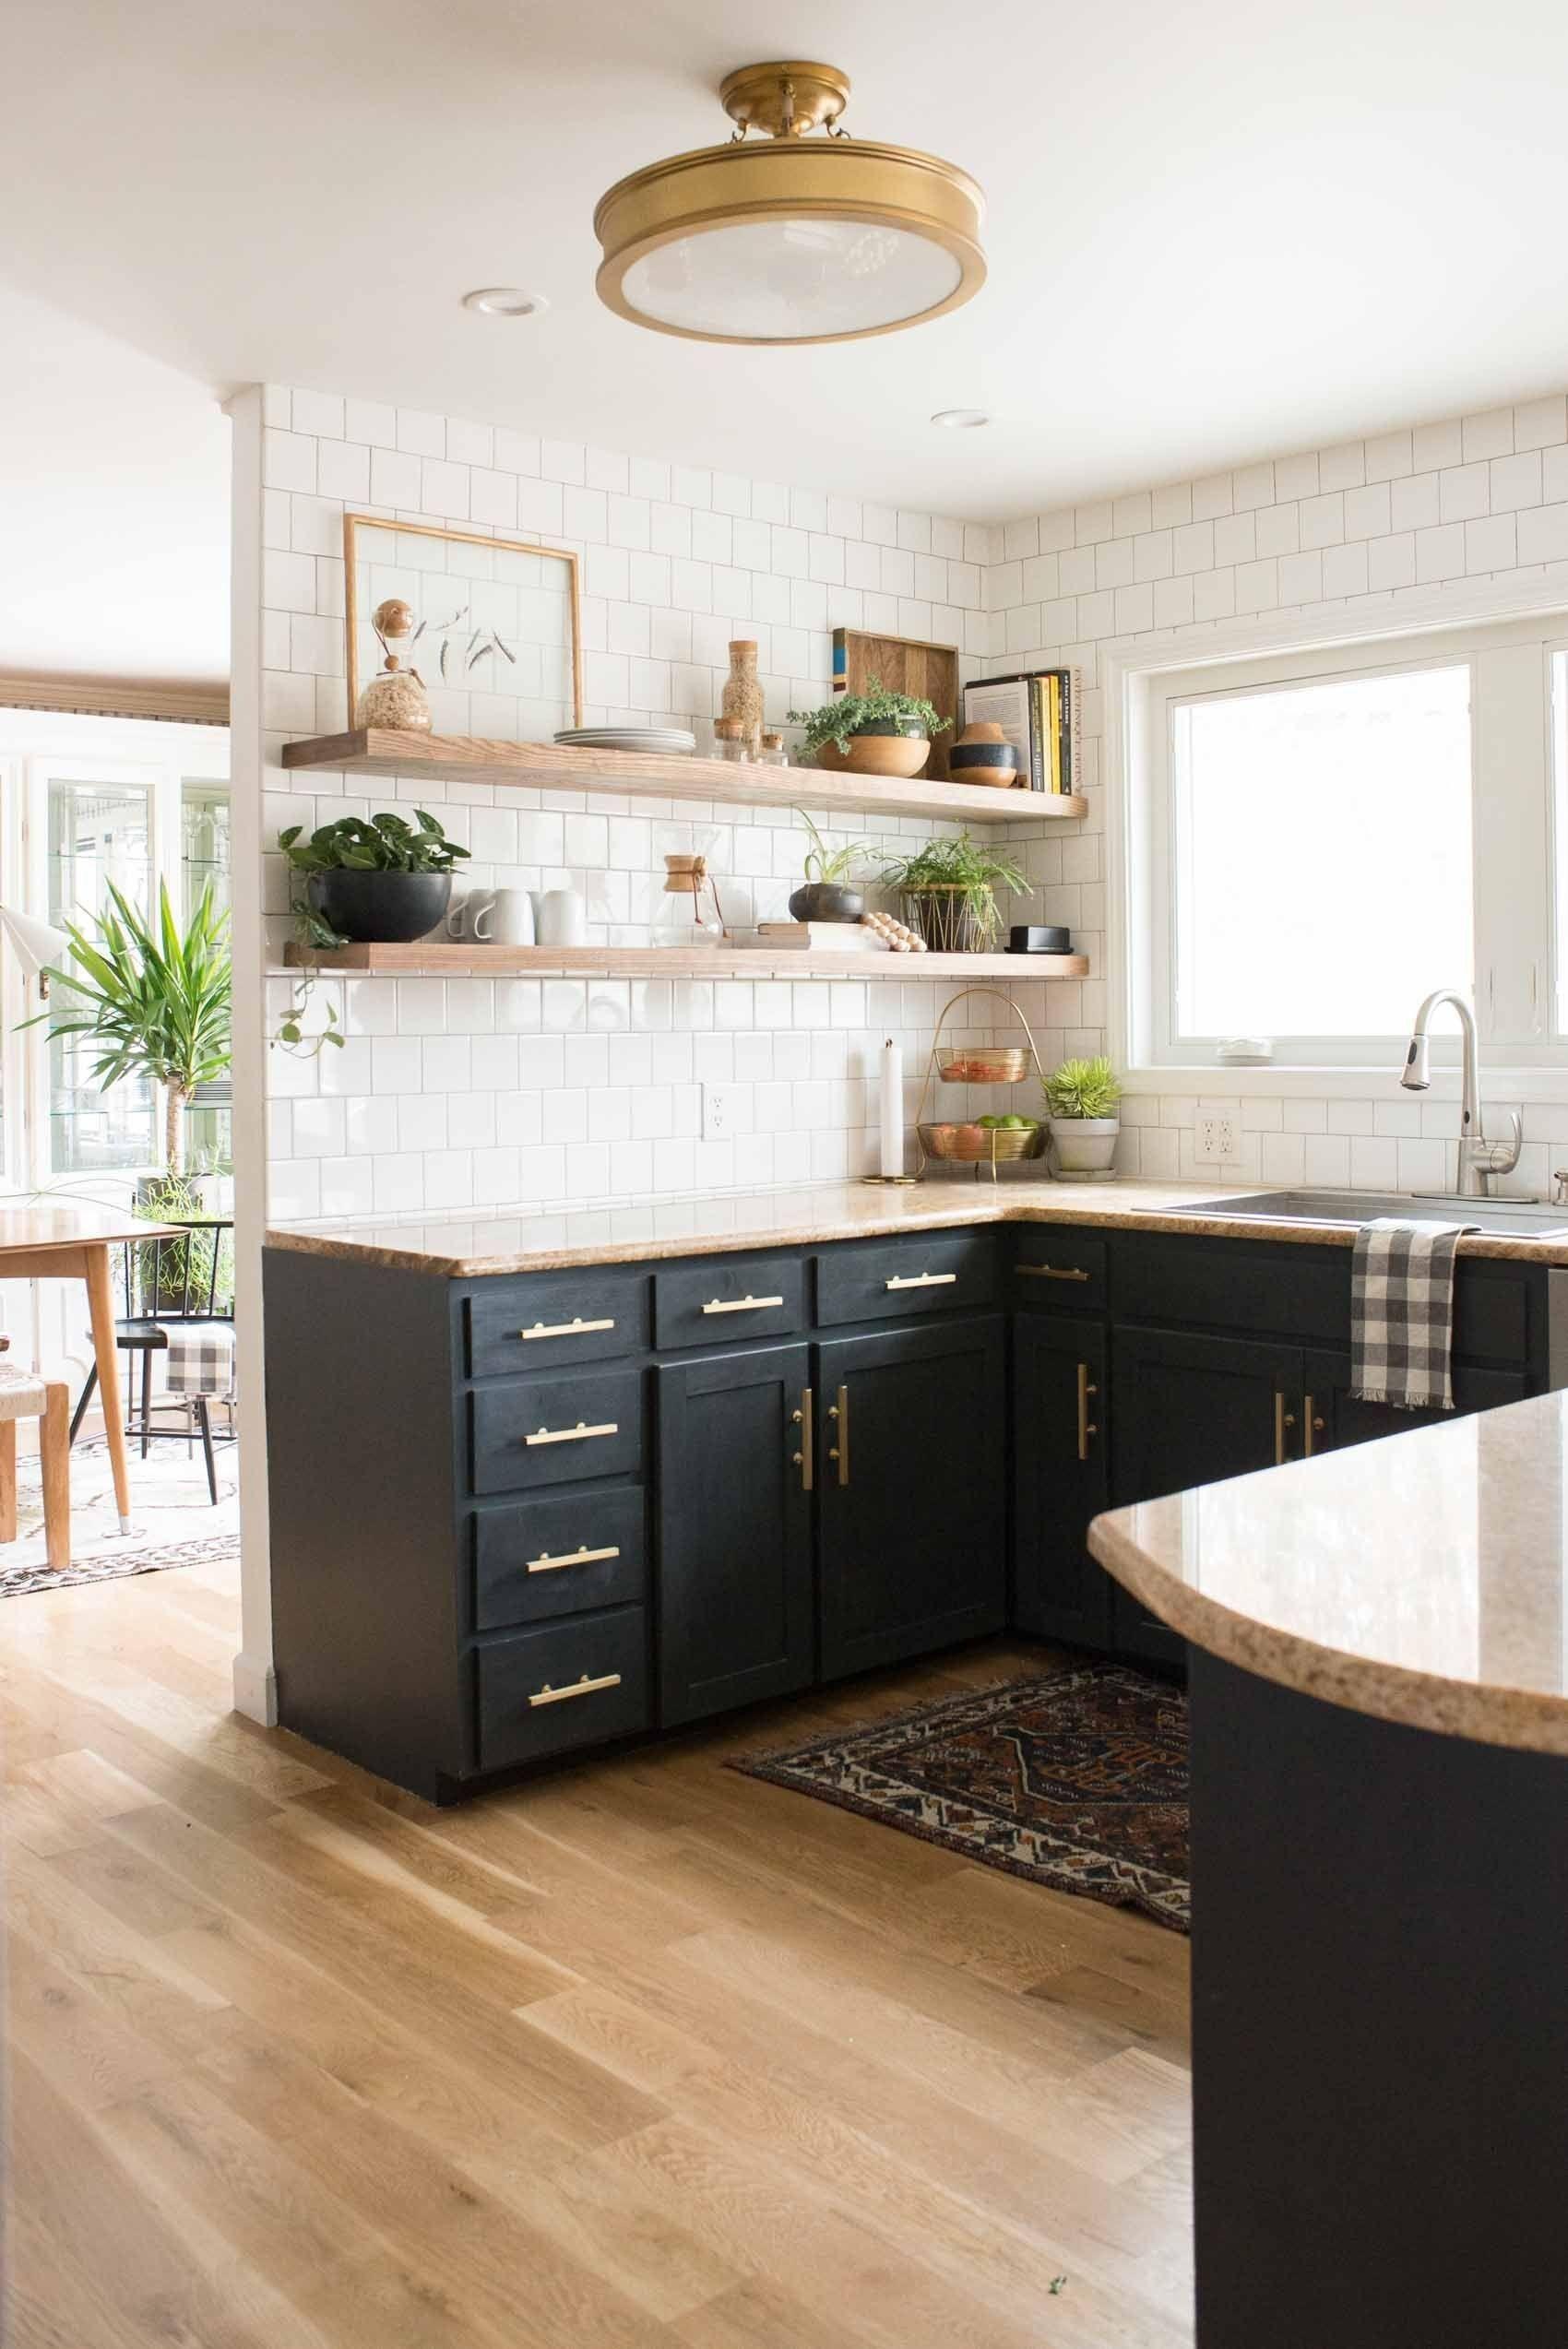 Impressive Kitchen Makeover Ideas On A Budget04 - TOPARCHITECTURE